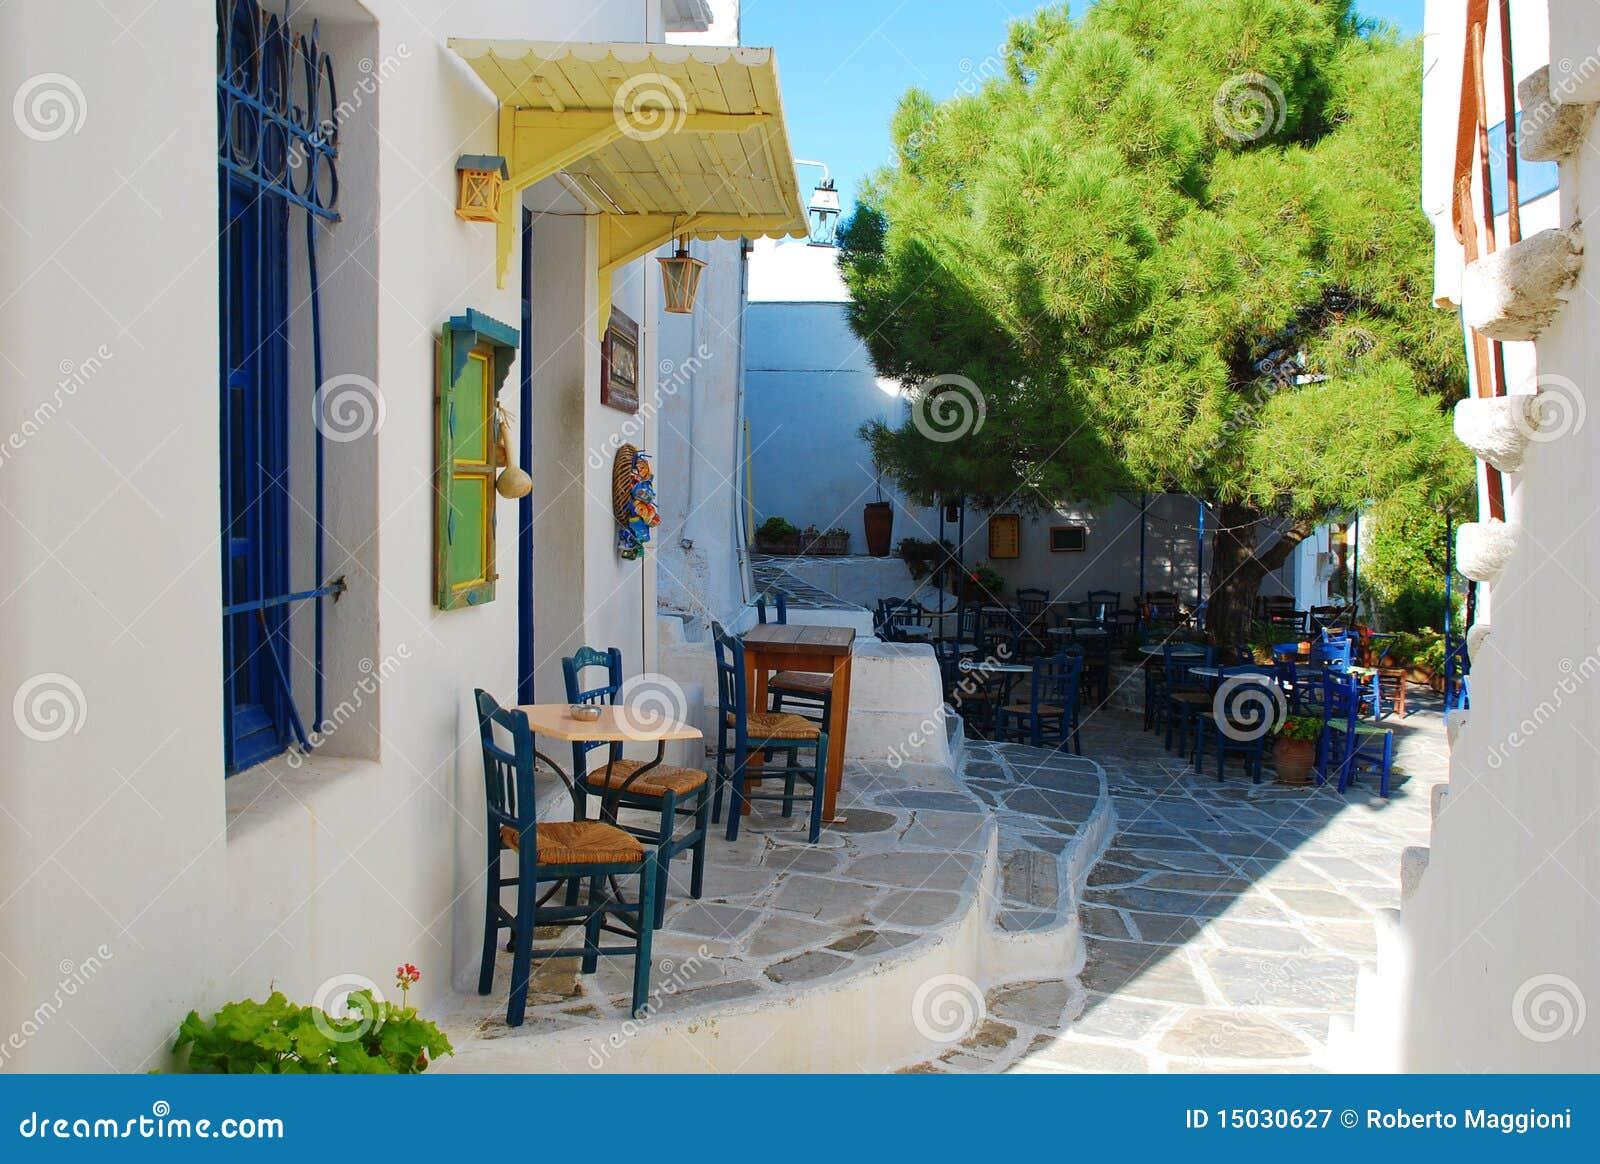 Grecia, isla de Paros, café